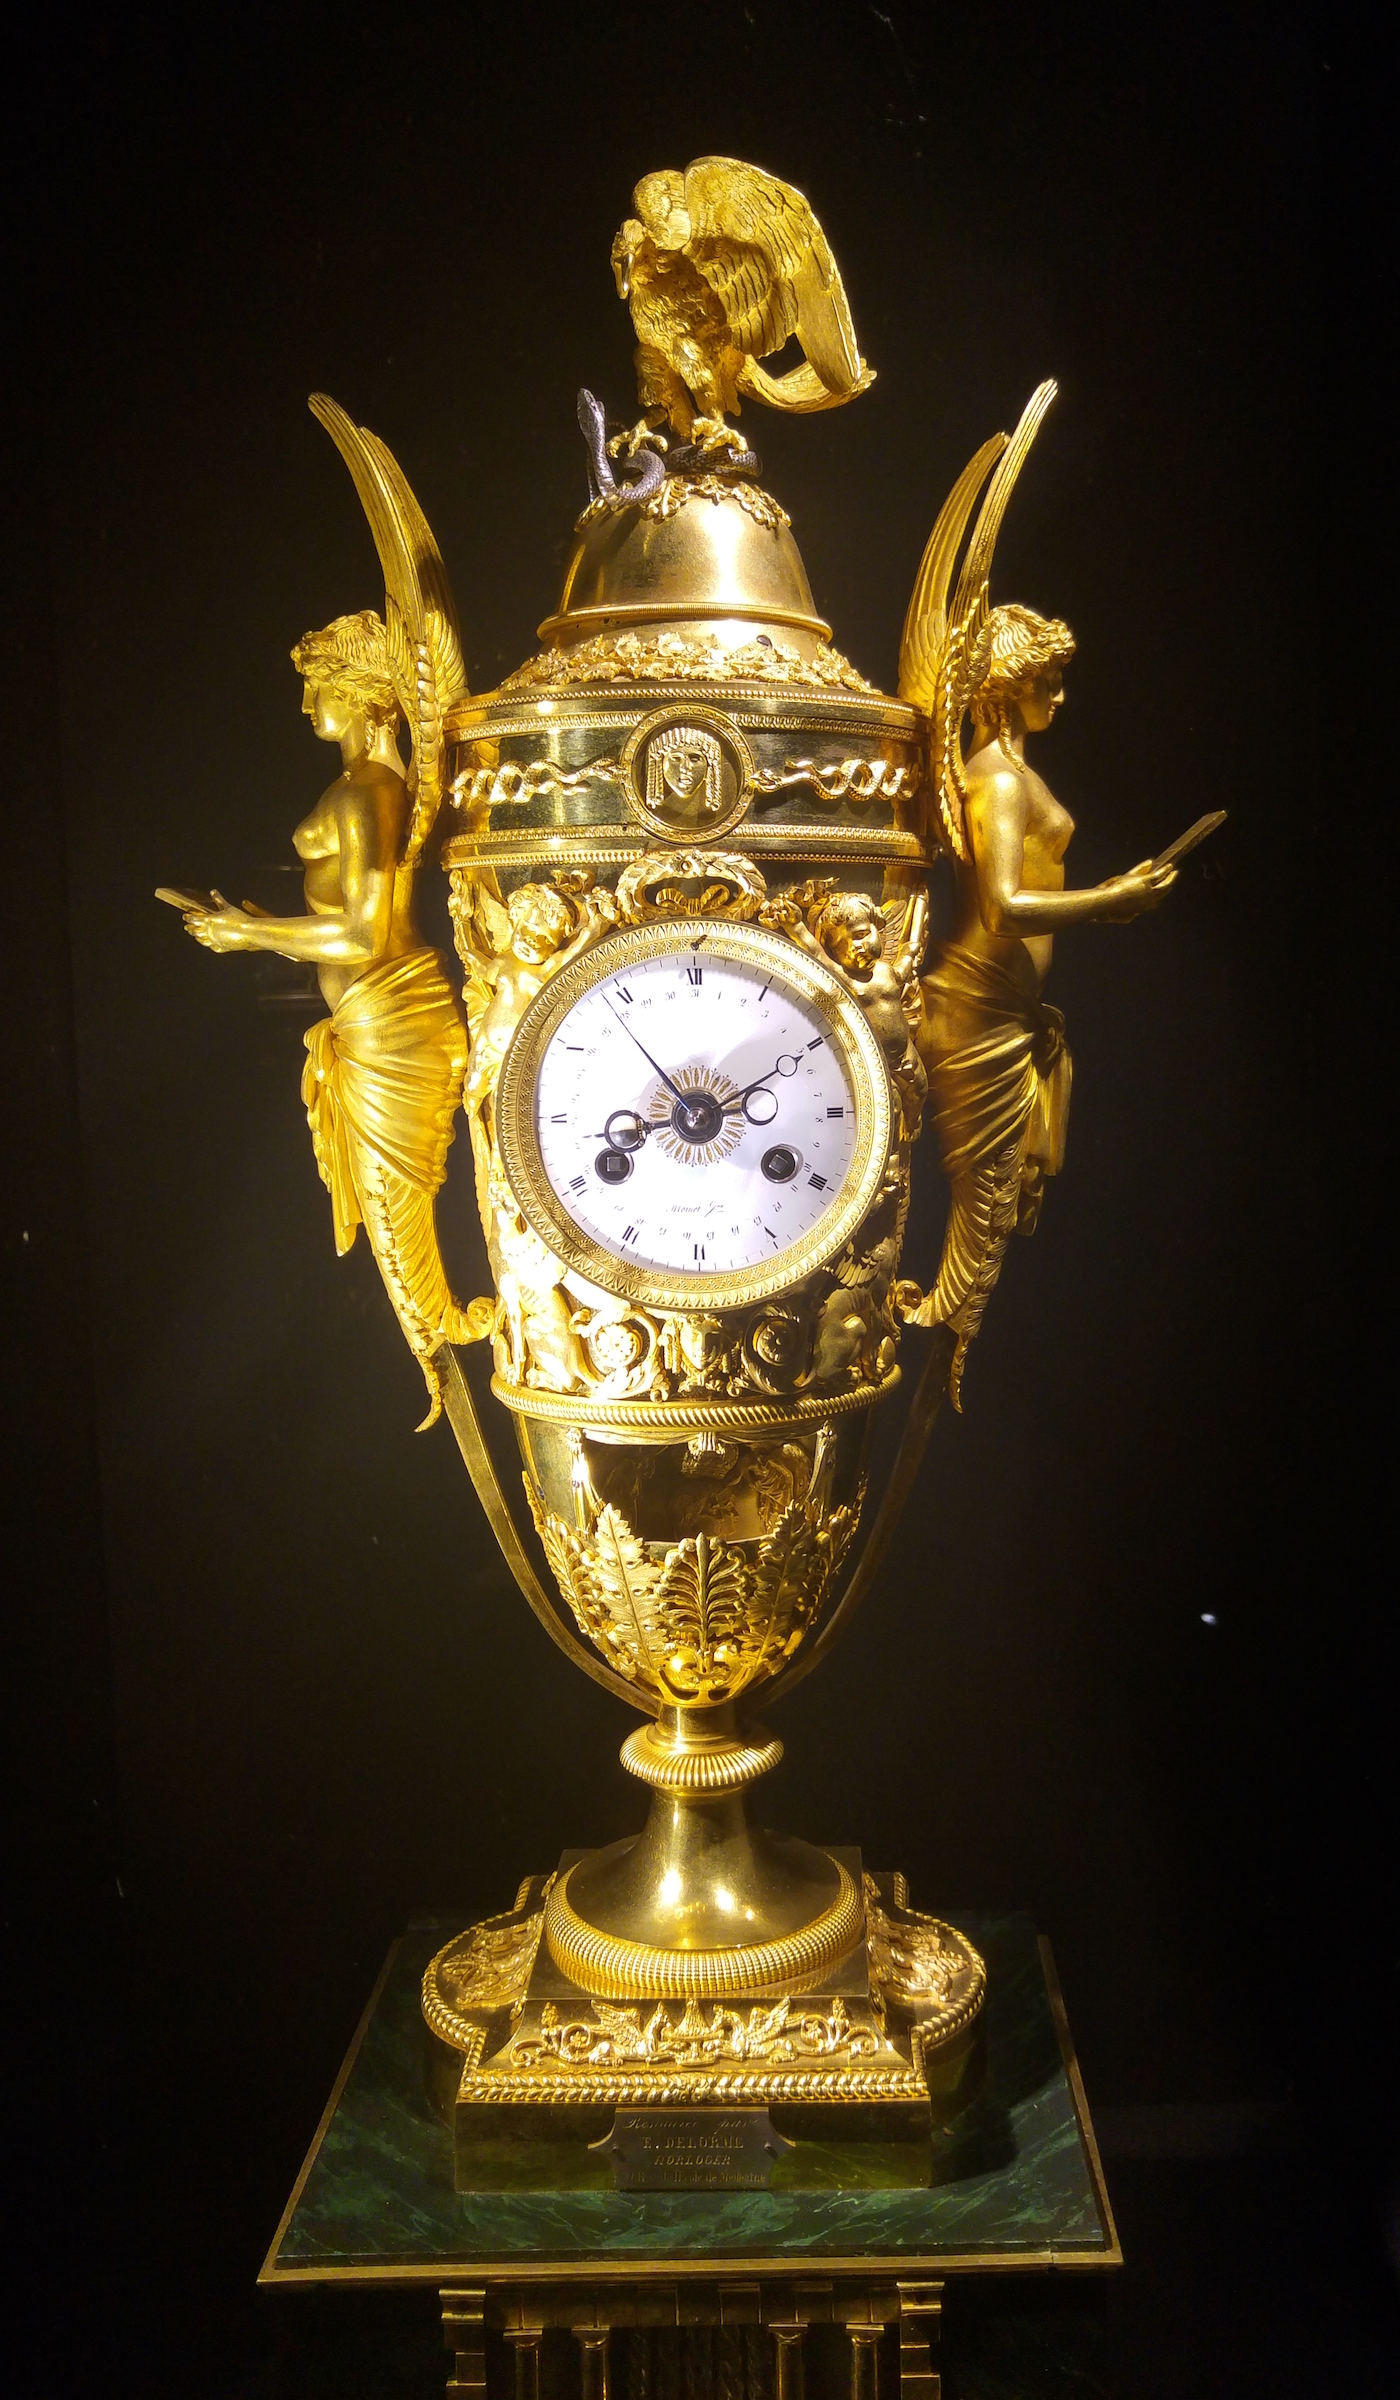 Napoleon Clock, table clock with organ, movement, and automata, Louis Moinet le jeune, France (ca 1805)